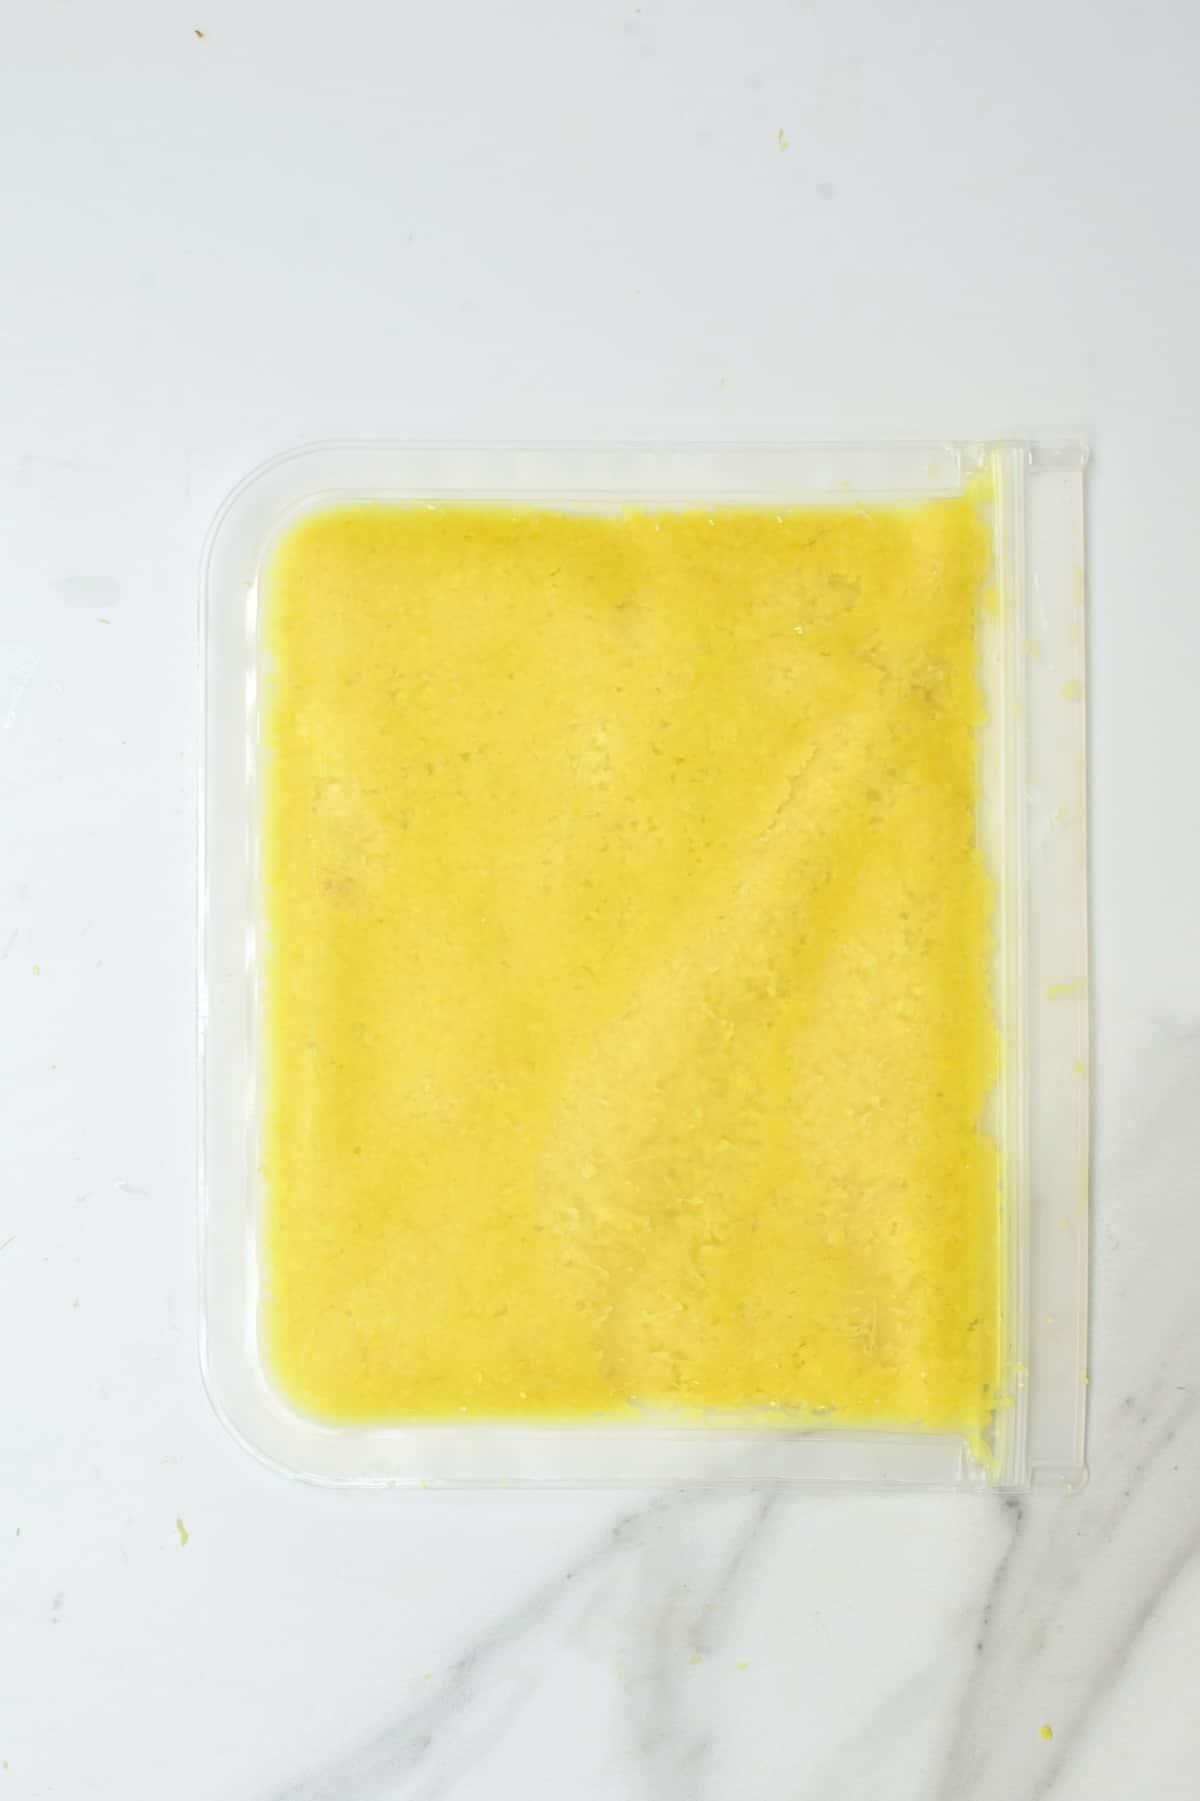 Ginger paste in a freezer bag